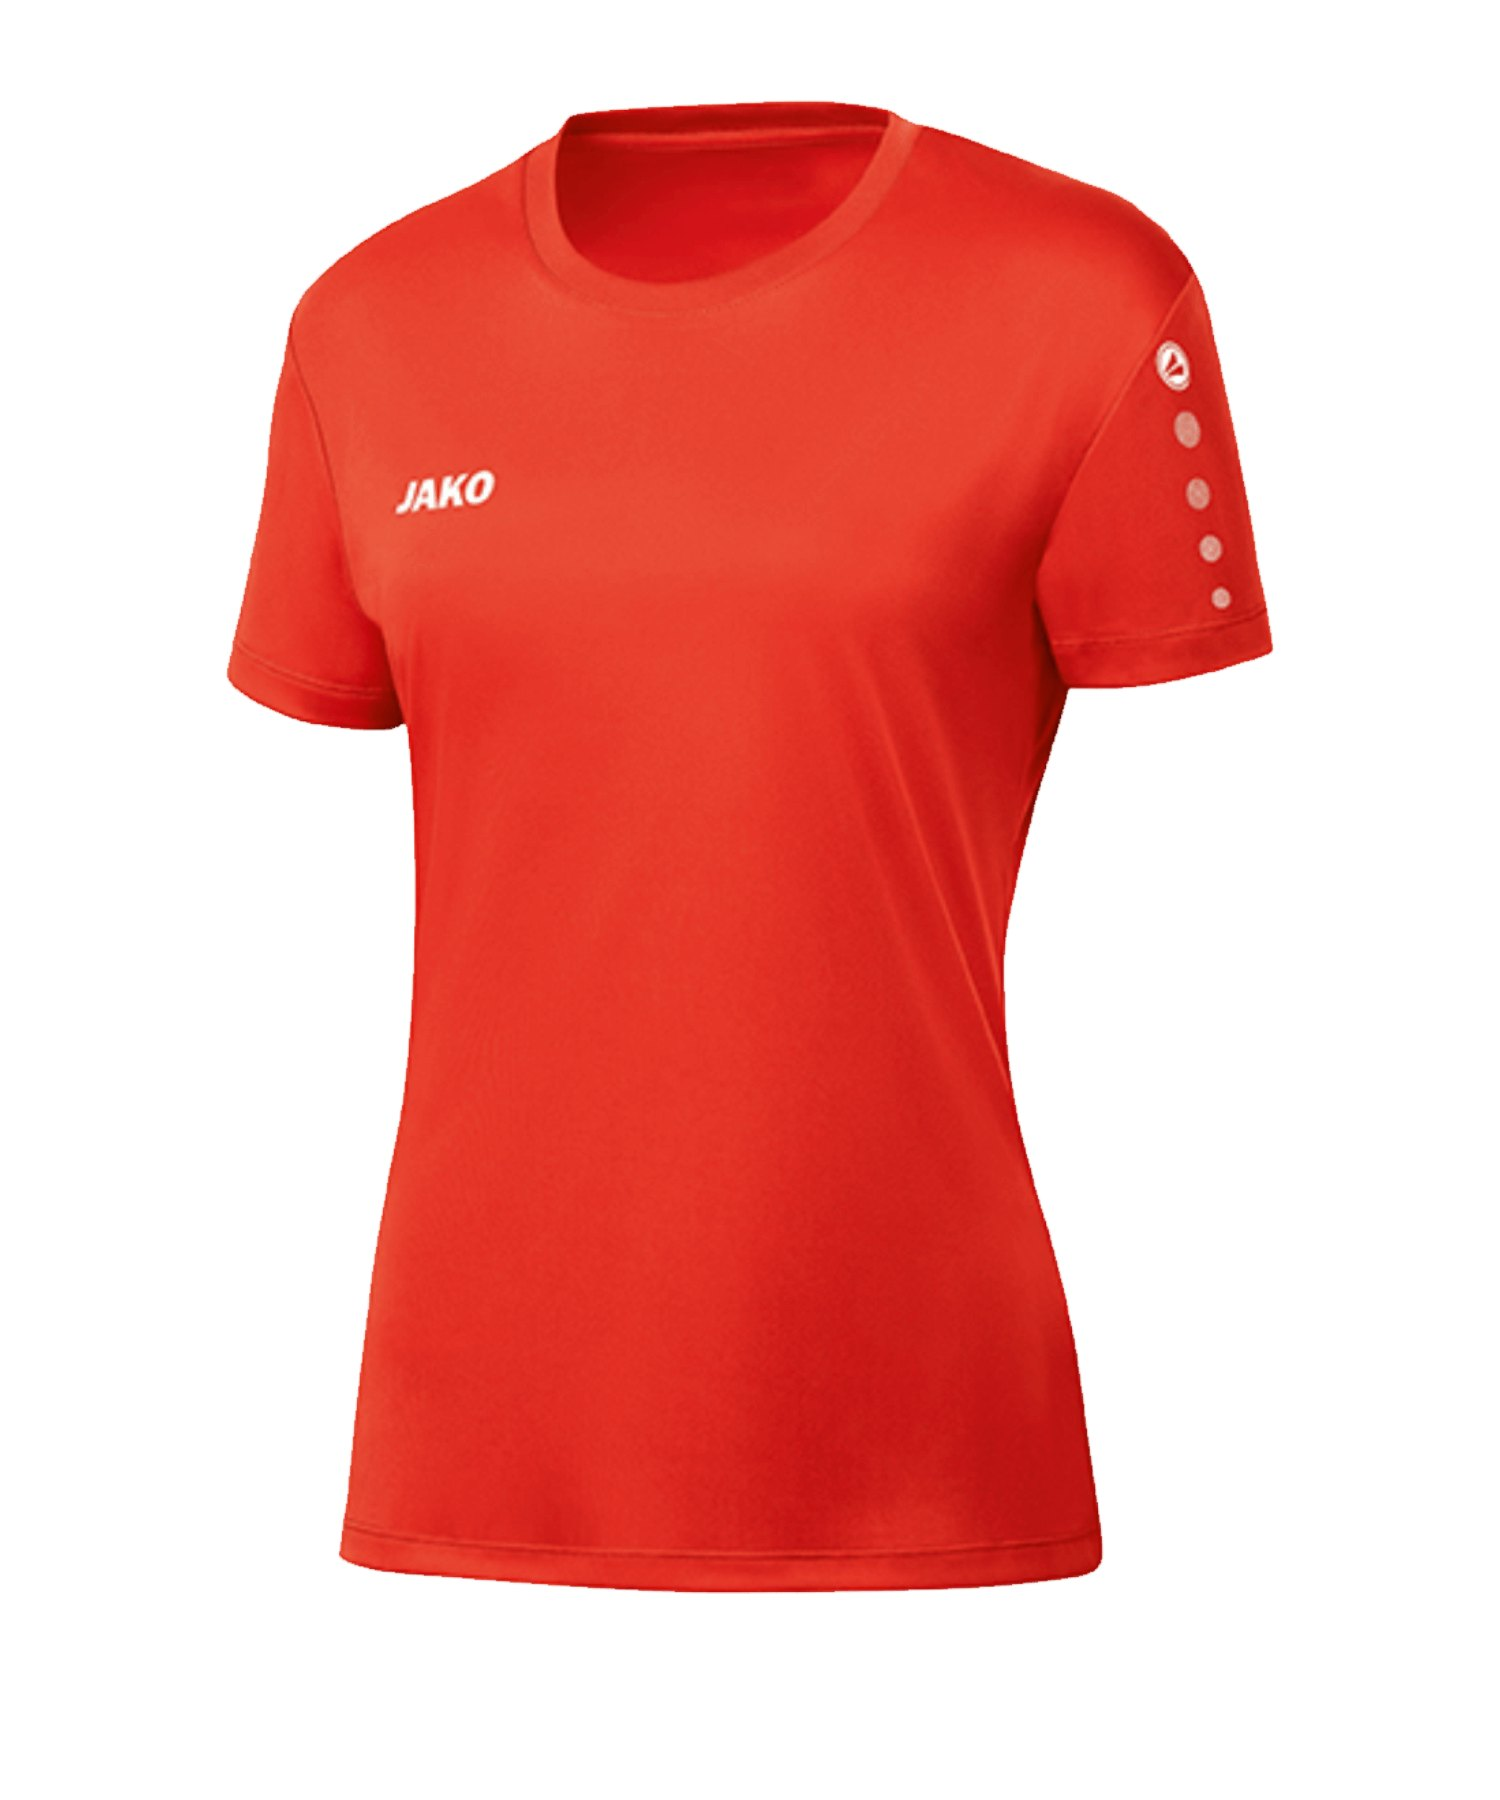 JAKO Team Trikot Damen Orange F18 - orange